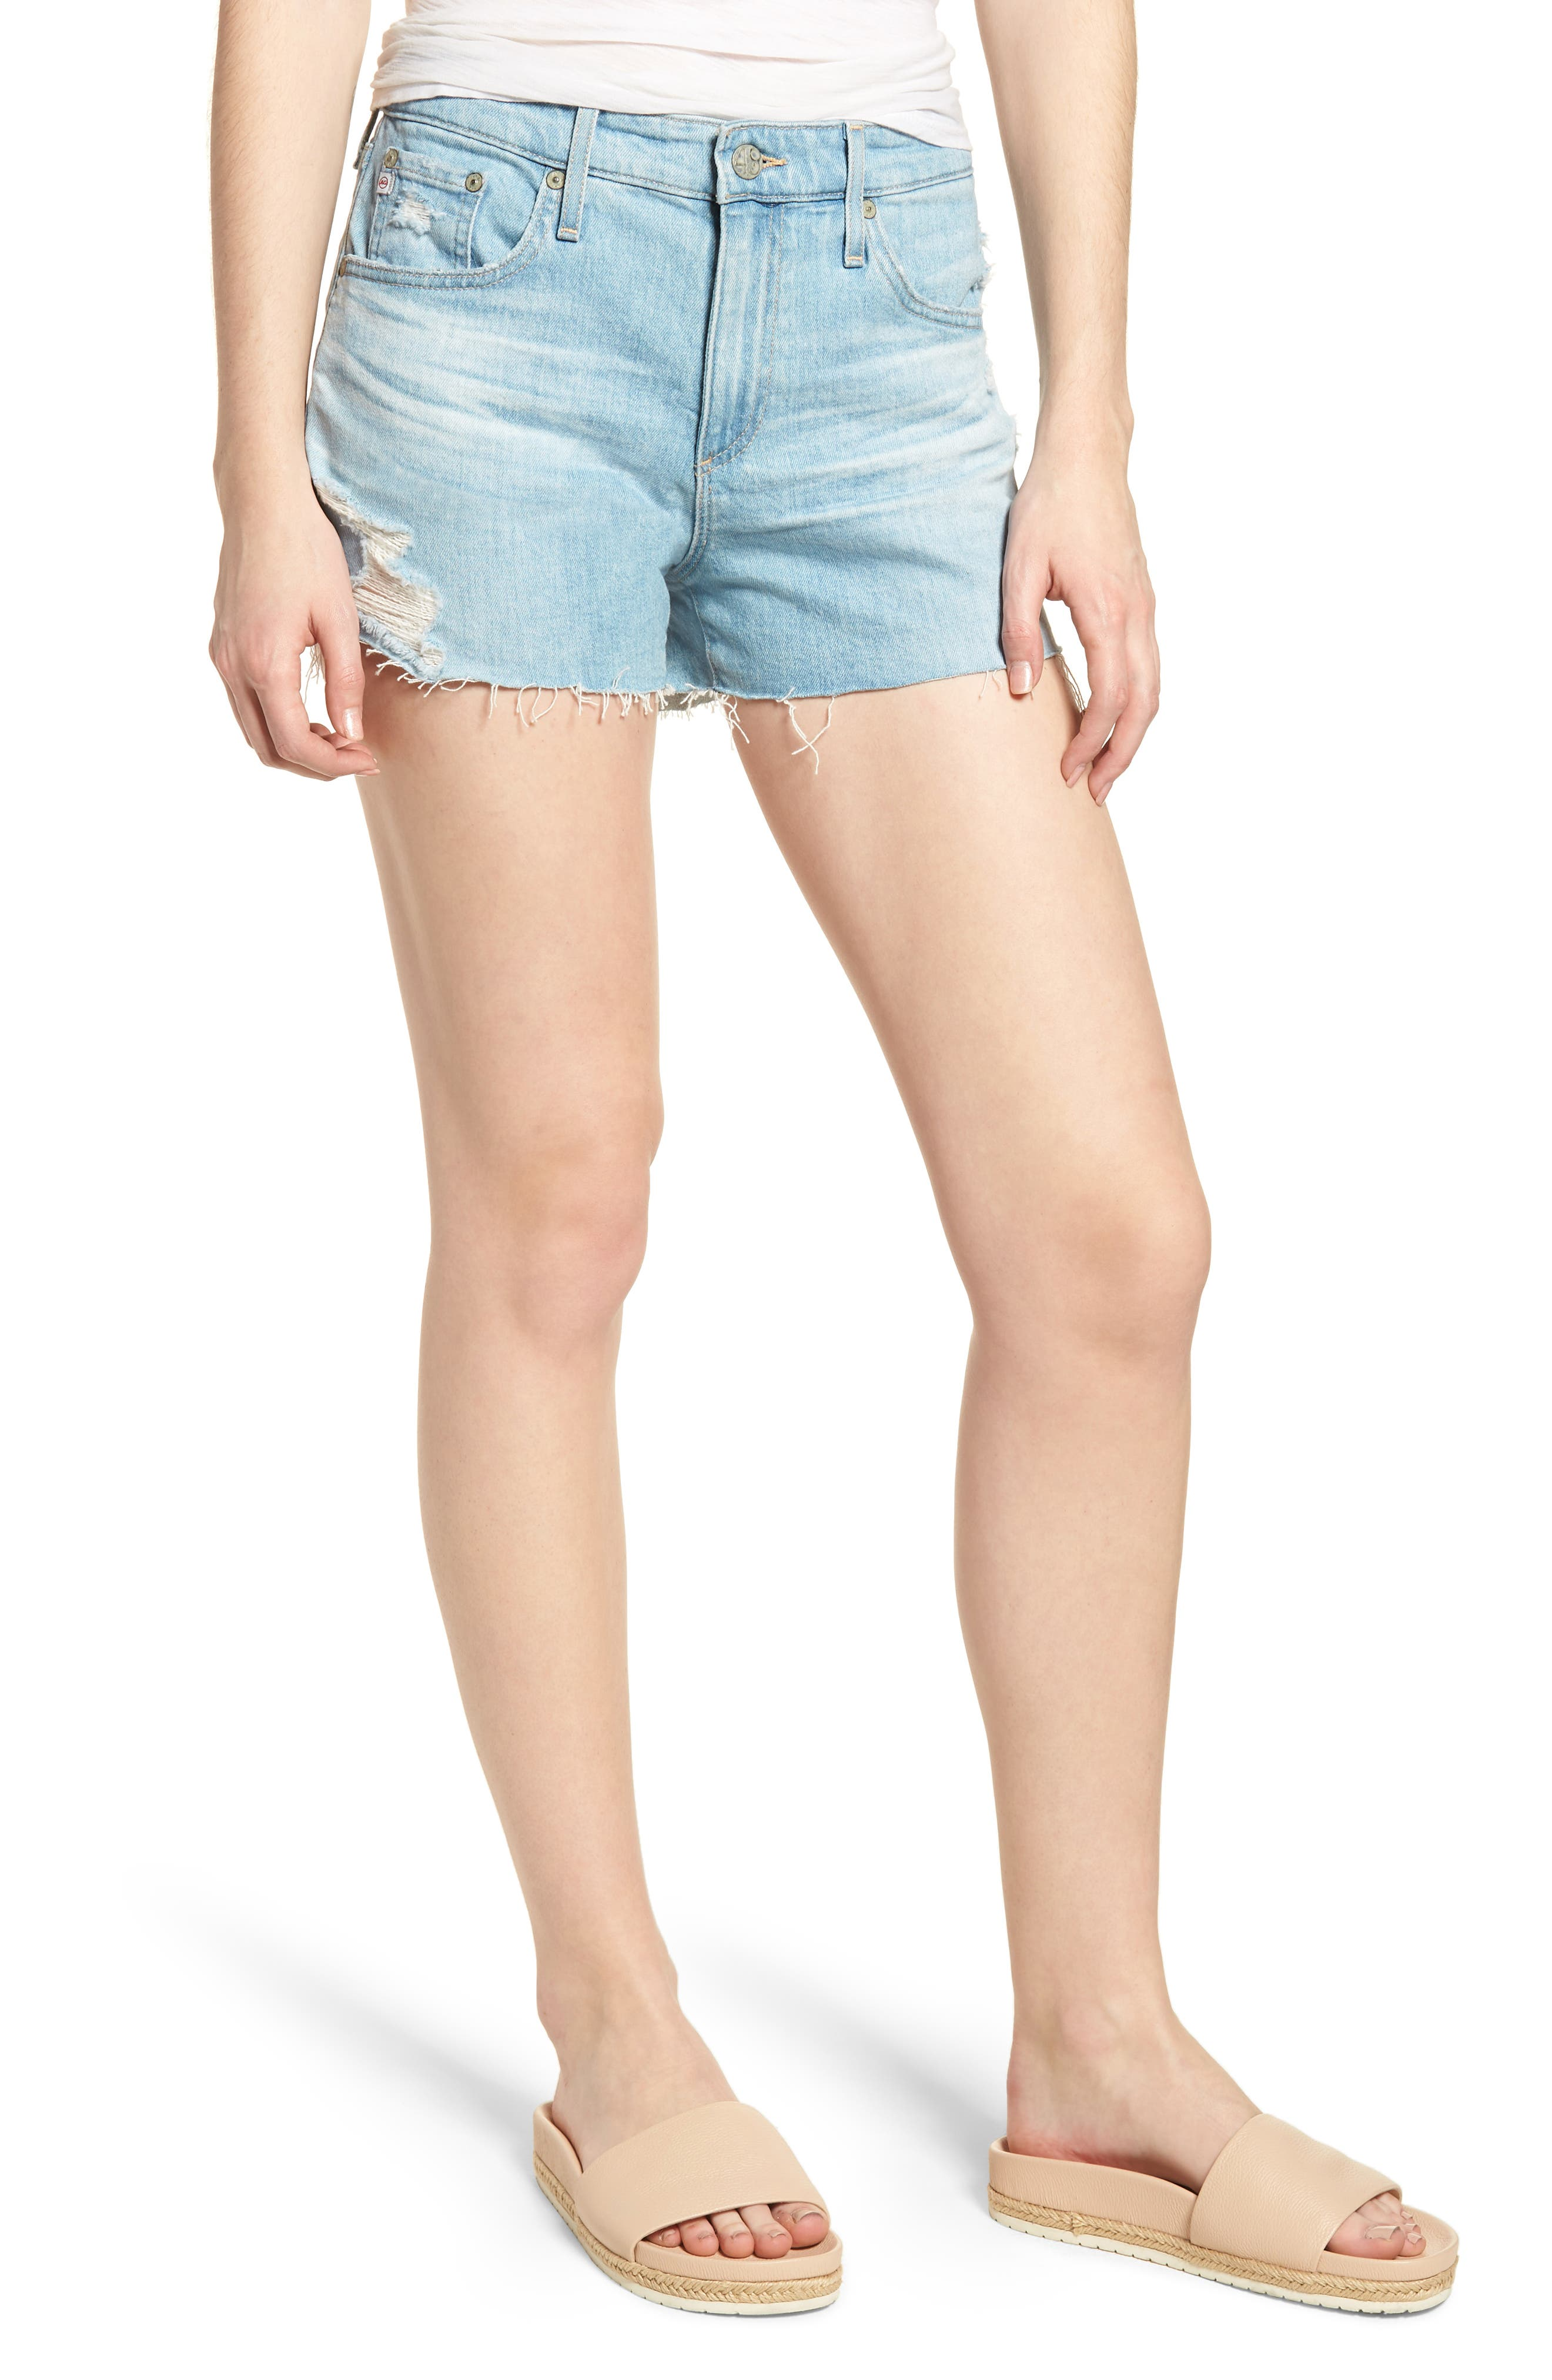 Bryn High Waist Cutoff Denim Shorts,                         Main,                         color, 23 Years Cerulean Chase